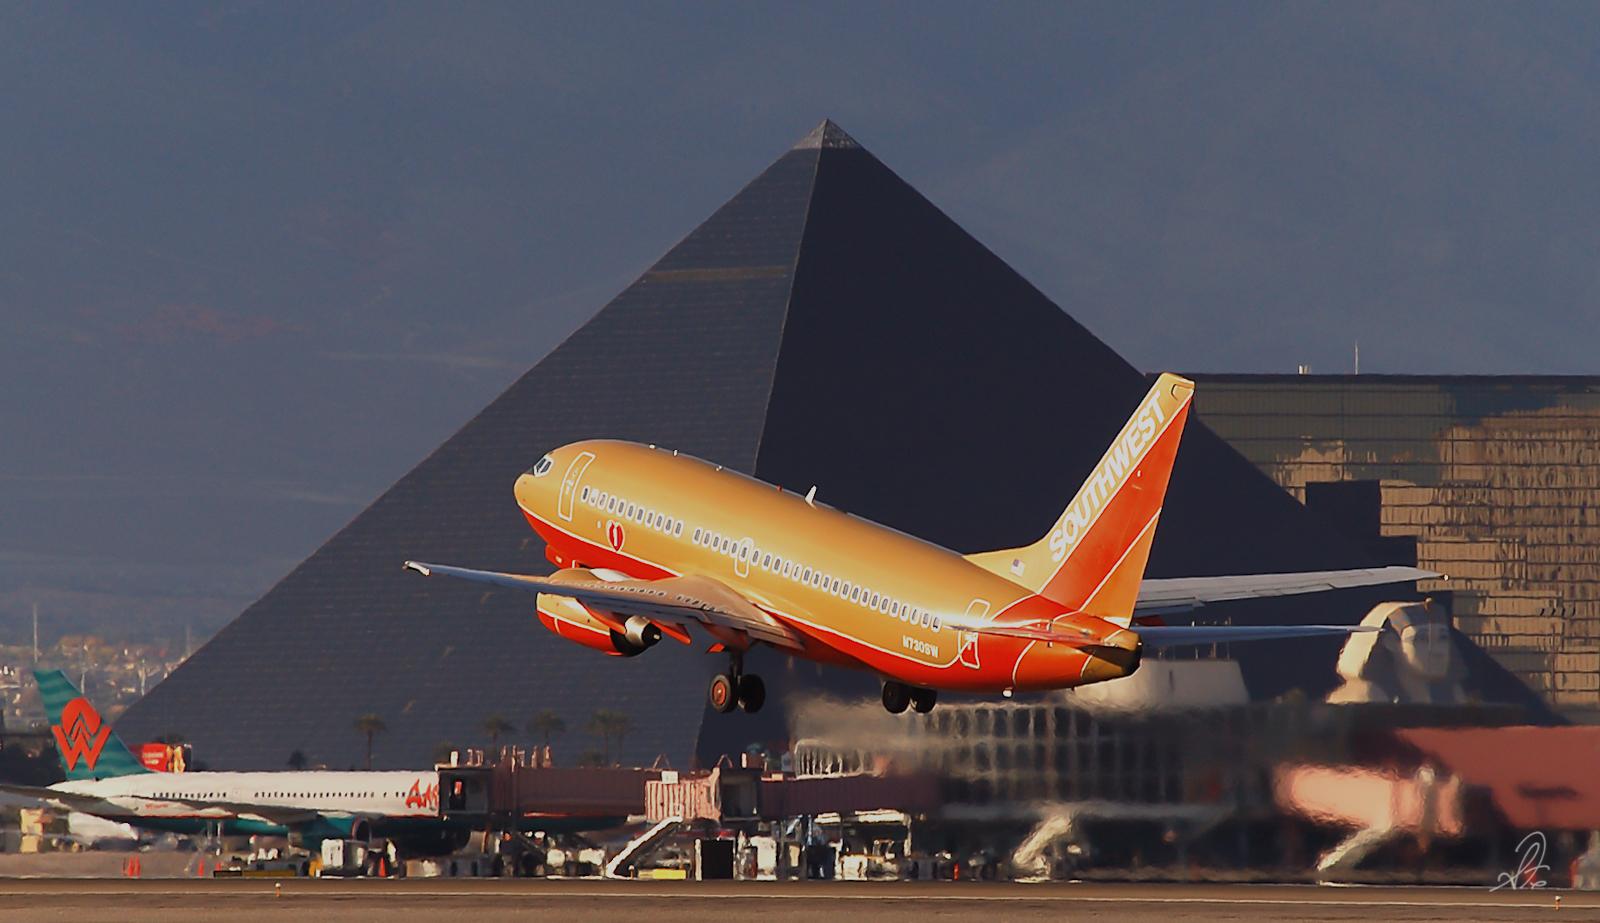 Southwest Airlines in Las Vegas Departs Over Excalibur